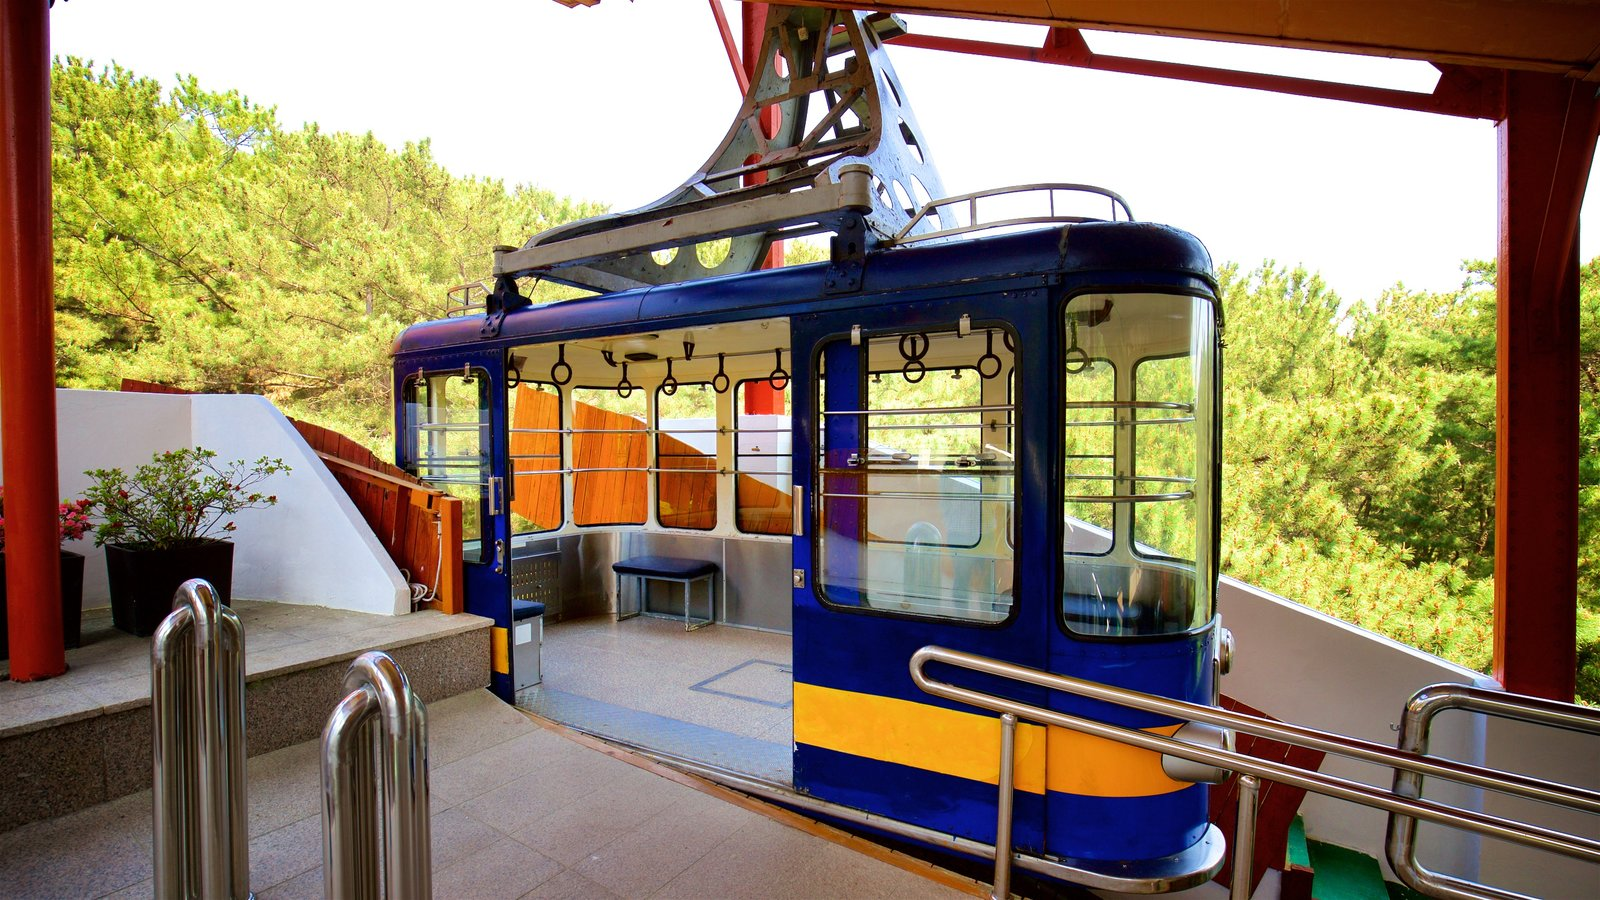 Namsan cable car - Namsan Cable Car Which Includes A Gondola